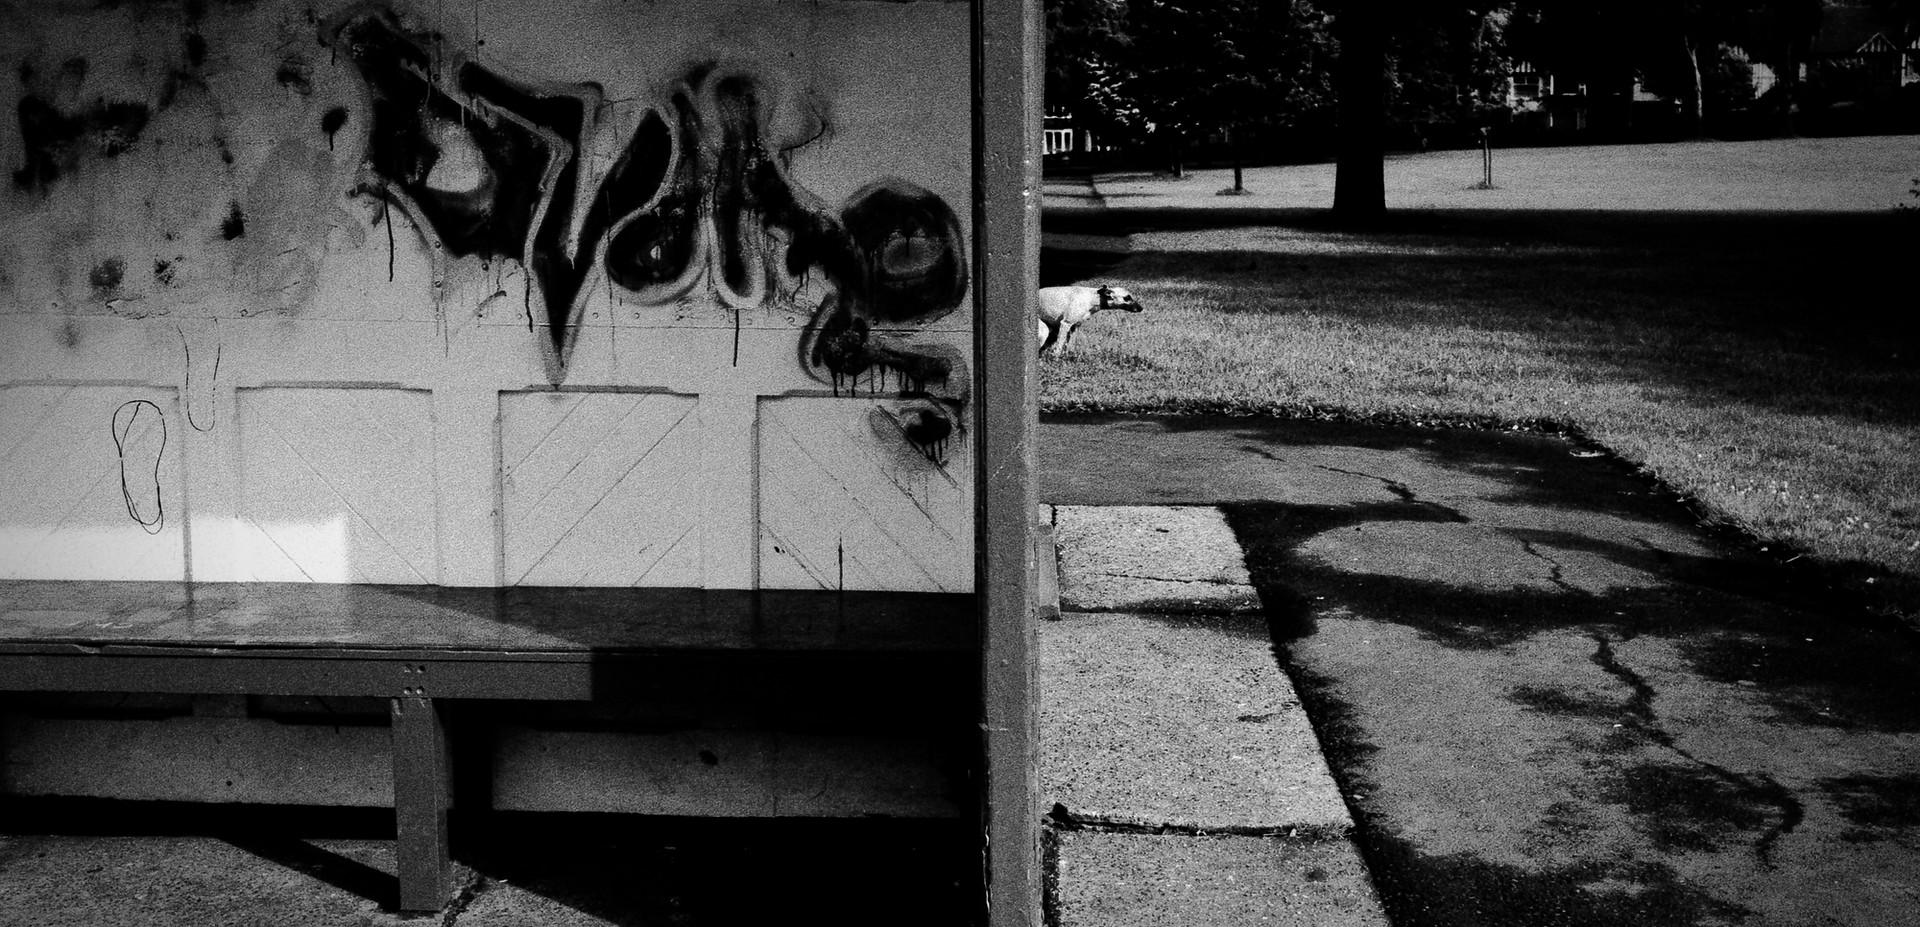 London, England 1985